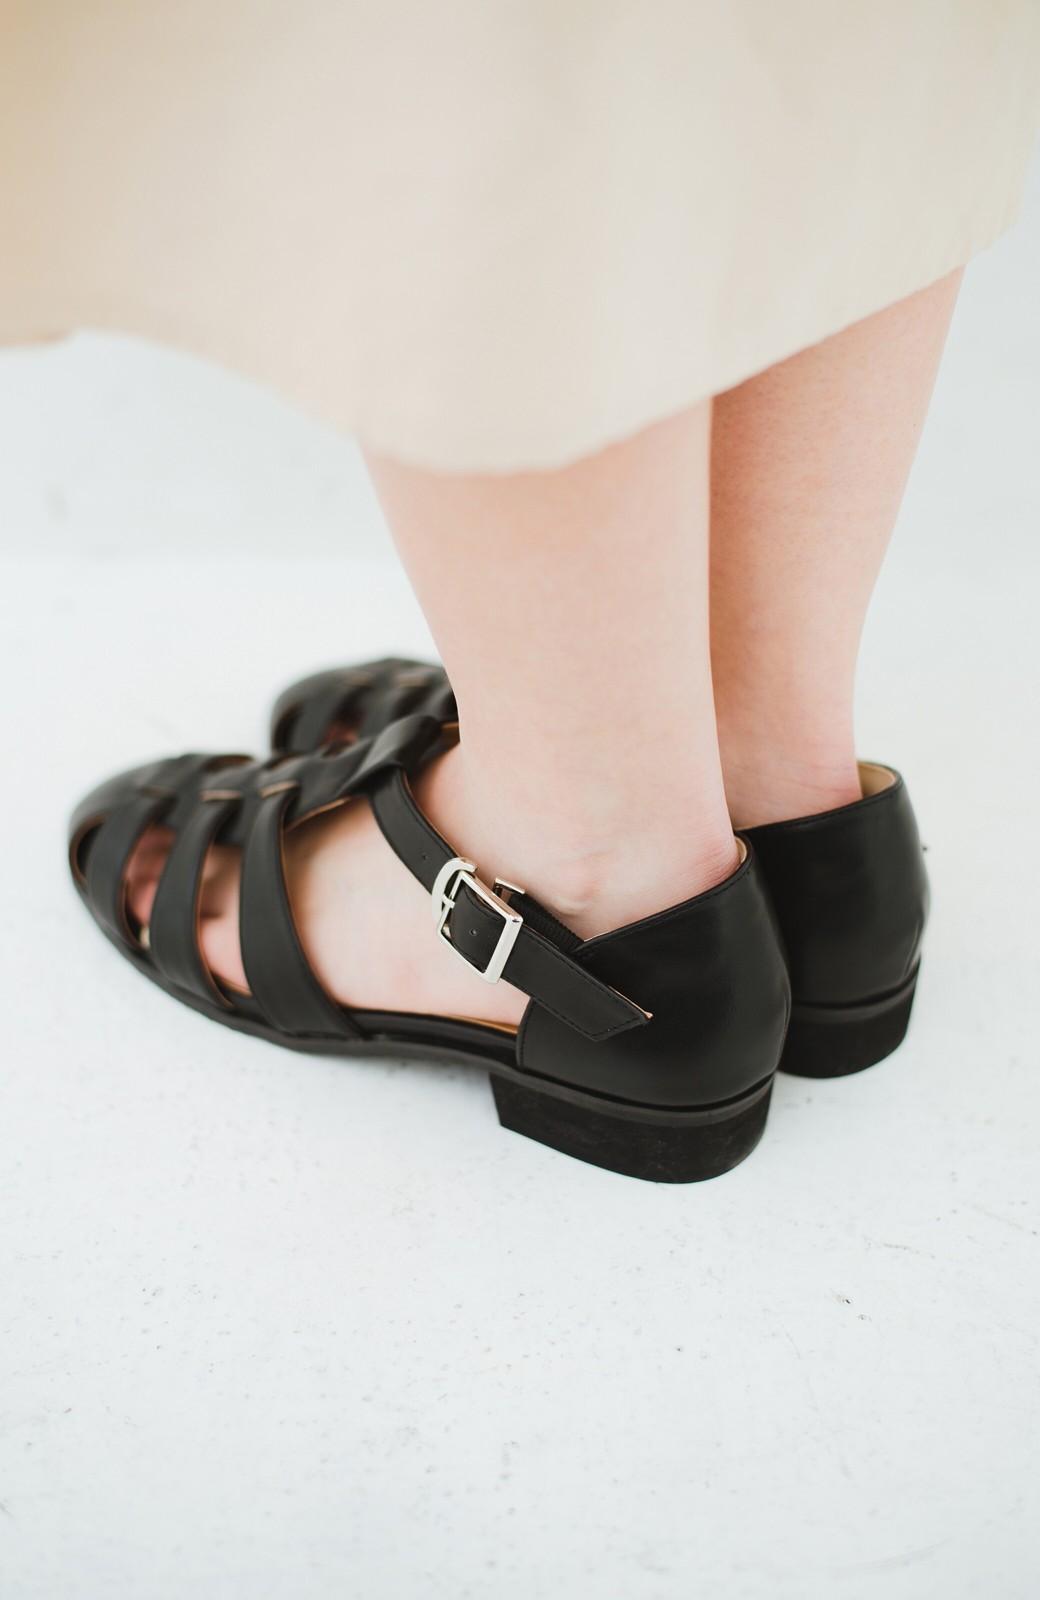 haco! 靴下でも素足でも合う 本革風編み込みサンダル <ブラック>の商品写真4